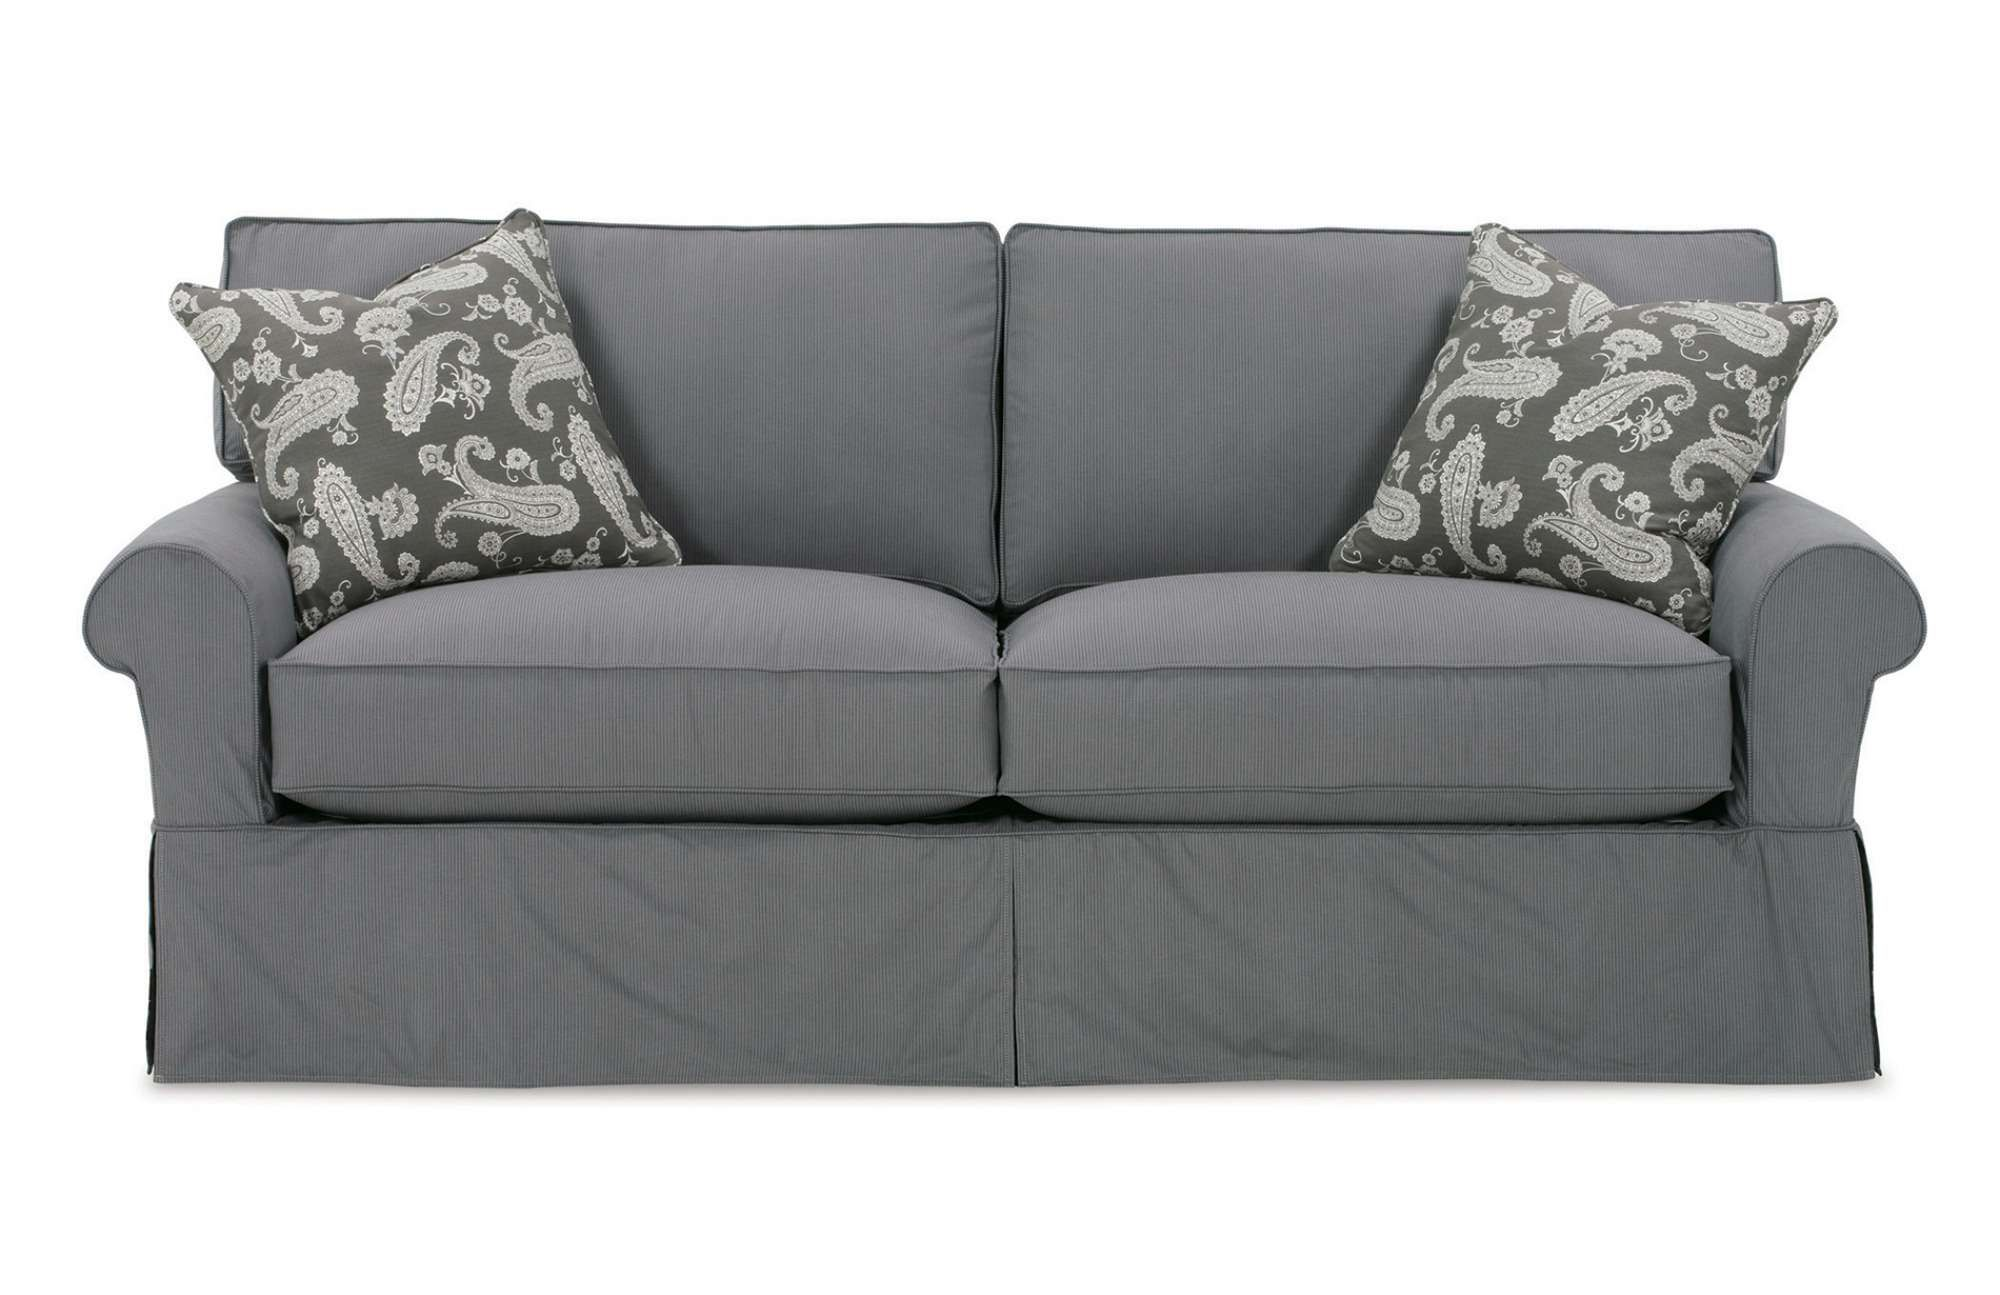 The Nantucket 2-Seat Slipcover Queen Sleeper Is A Modern